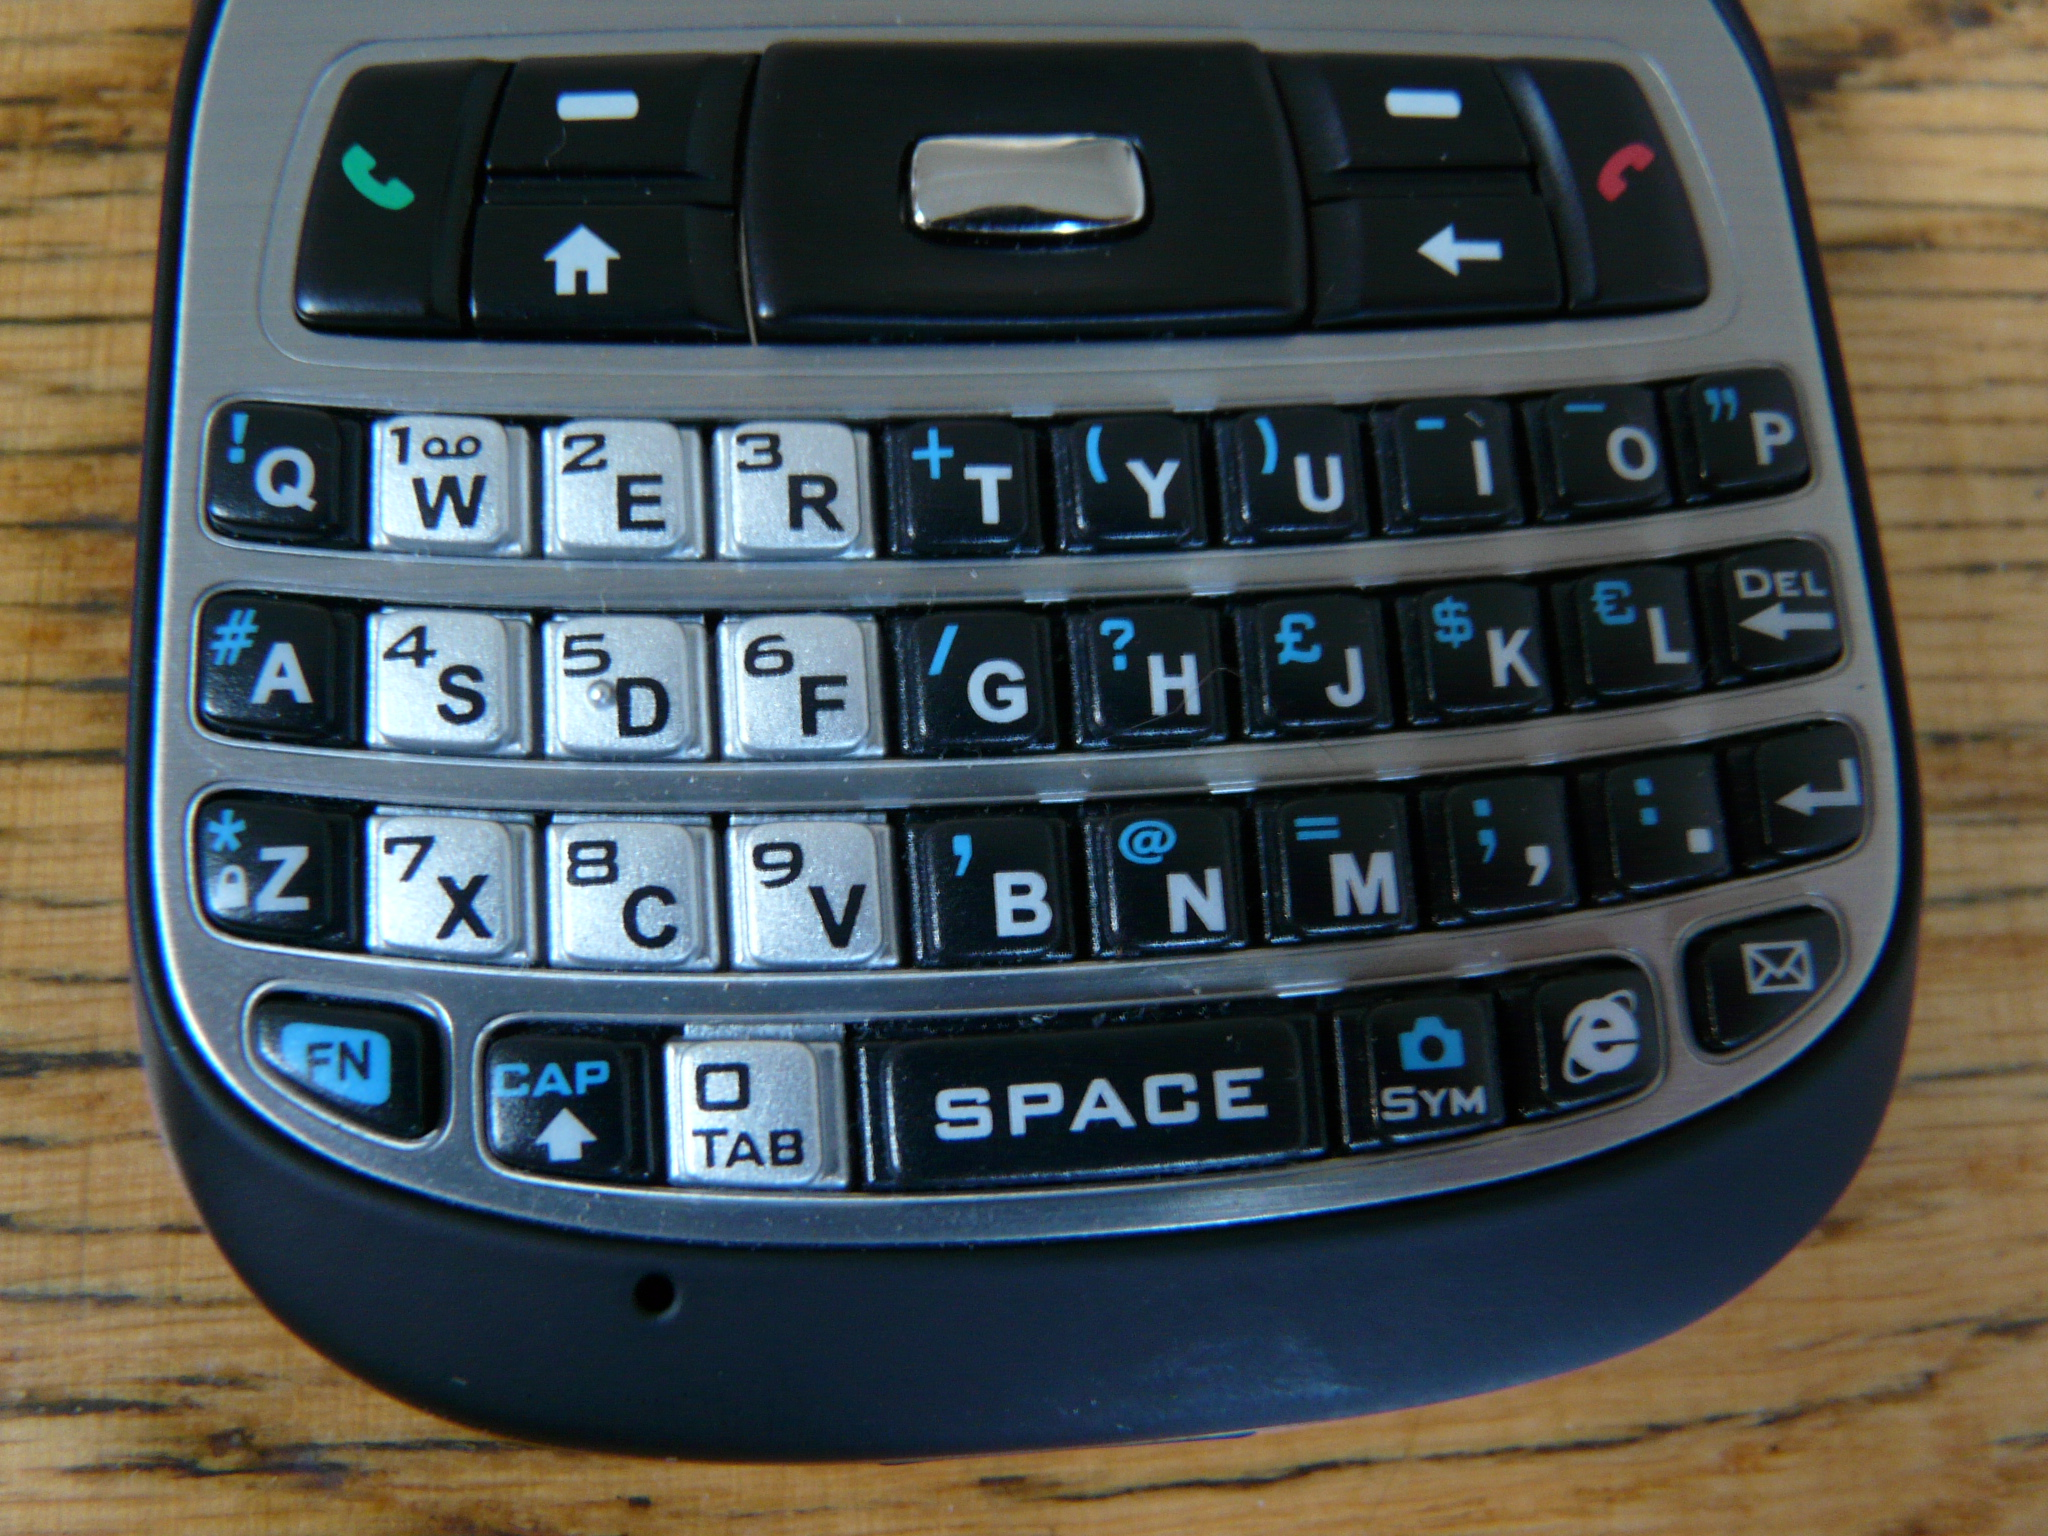 HTC Excalibur S620 / T-Mobile Dash Review « TheONbutton ...